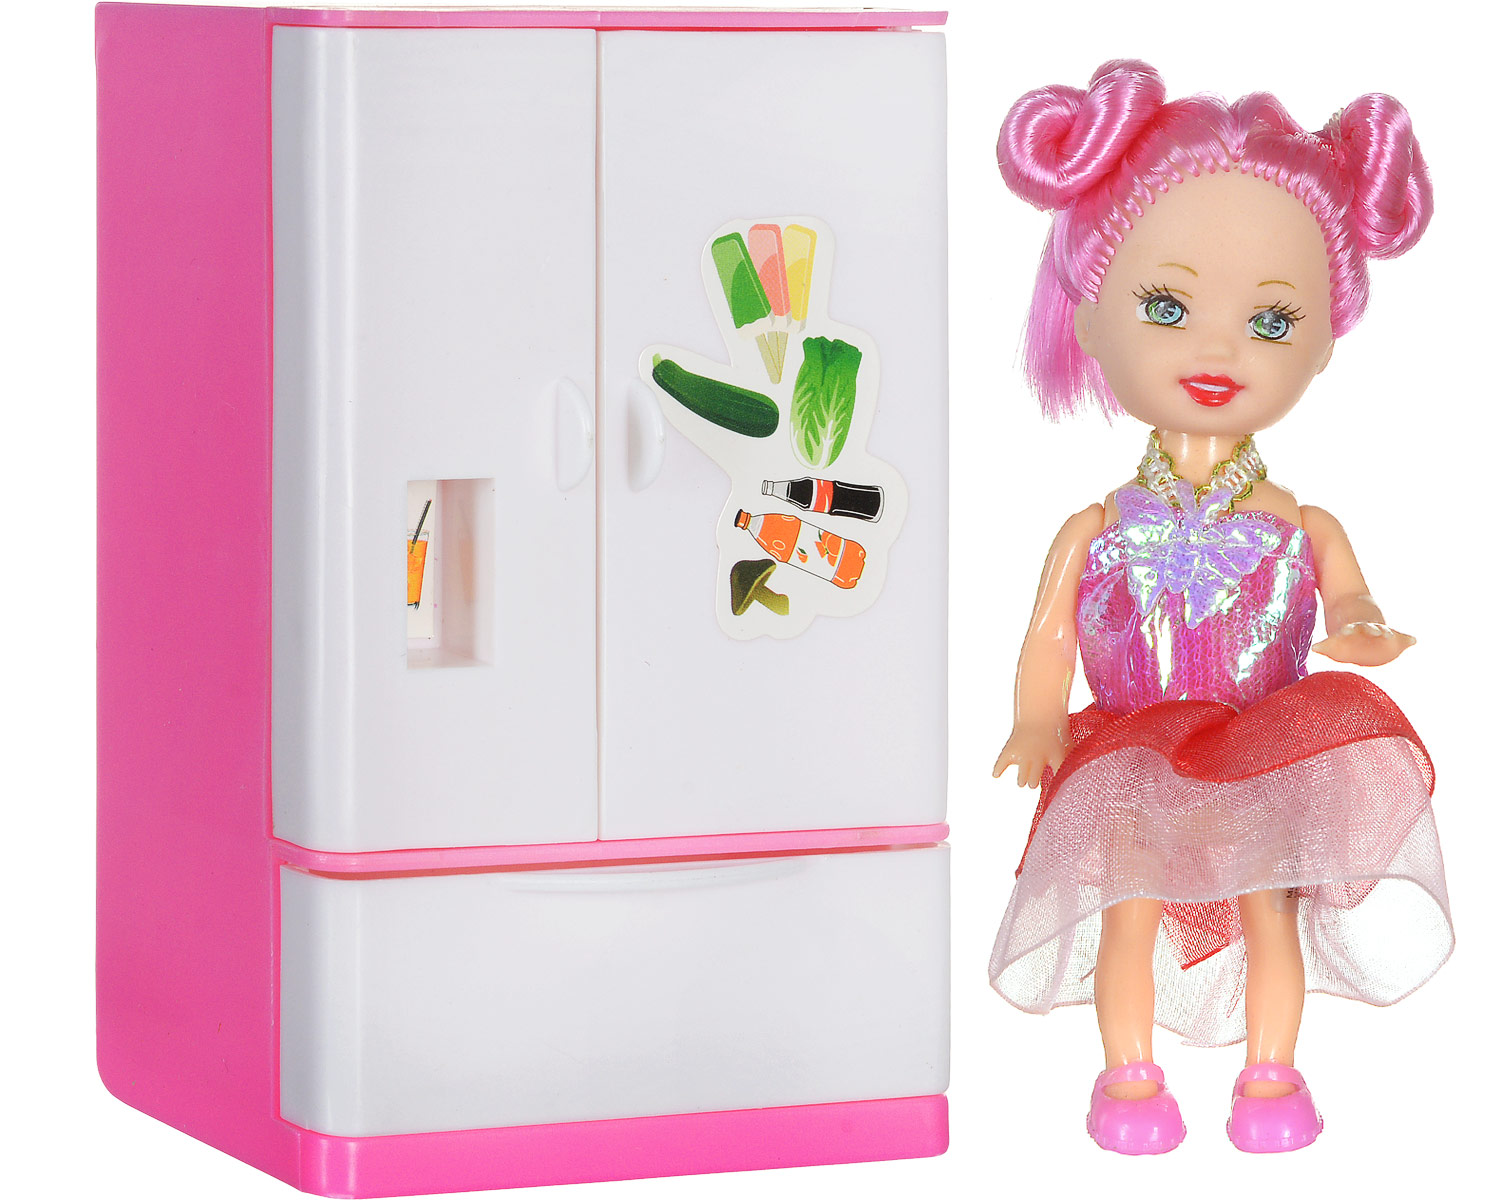 Shantou Мини-кукла Bettina с холодильником